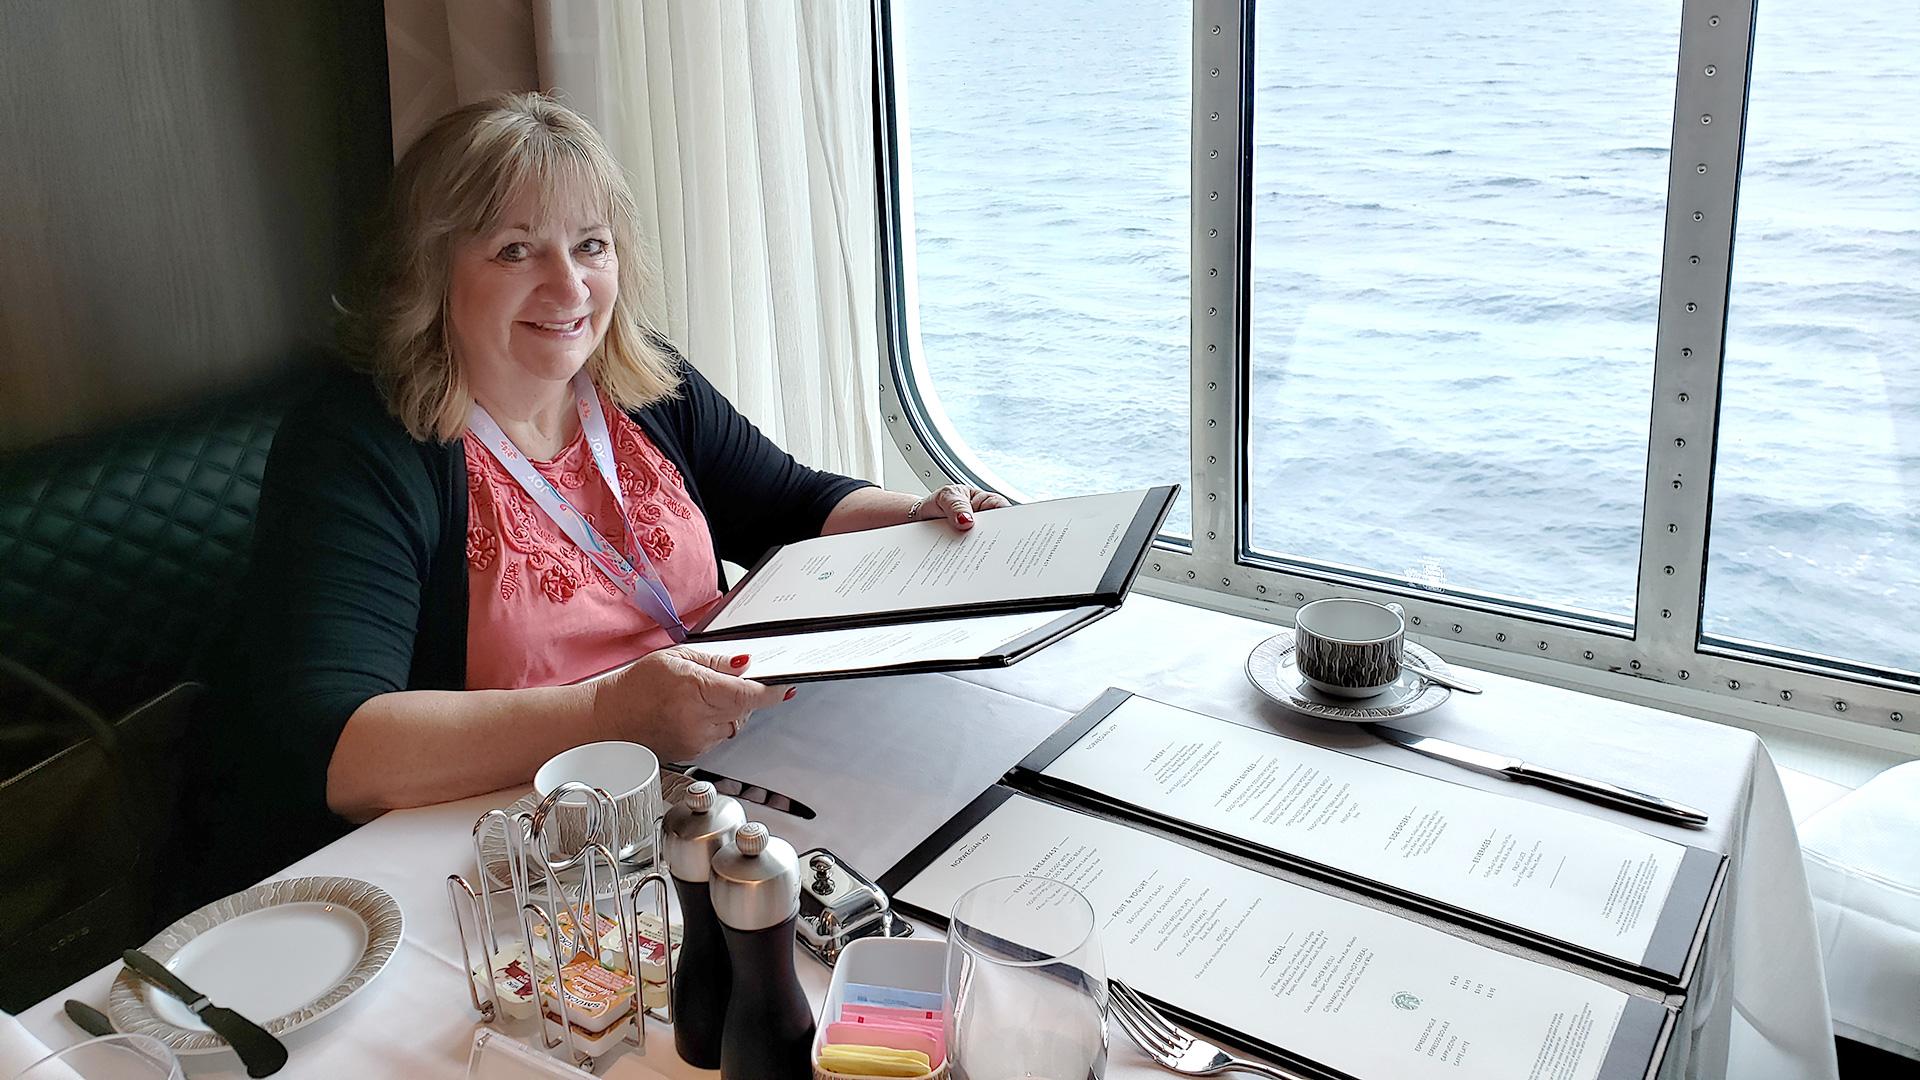 Kerry enjoying her cruise